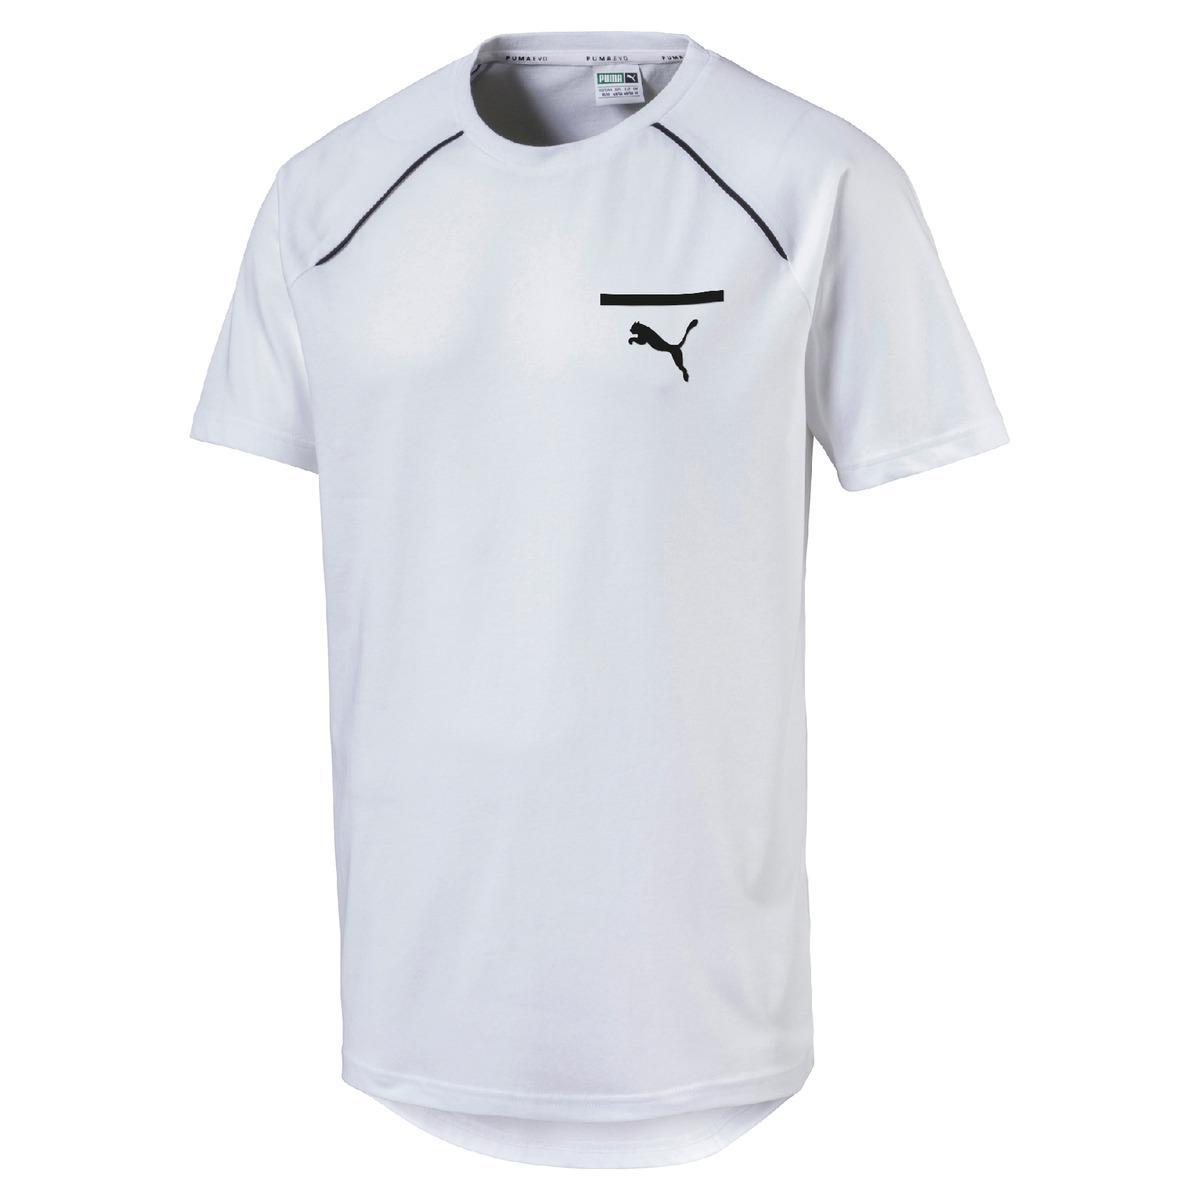 3167193cc32 Gallery. Previously sold at: El Corte Ingles · Men's Logo T Shirts ...